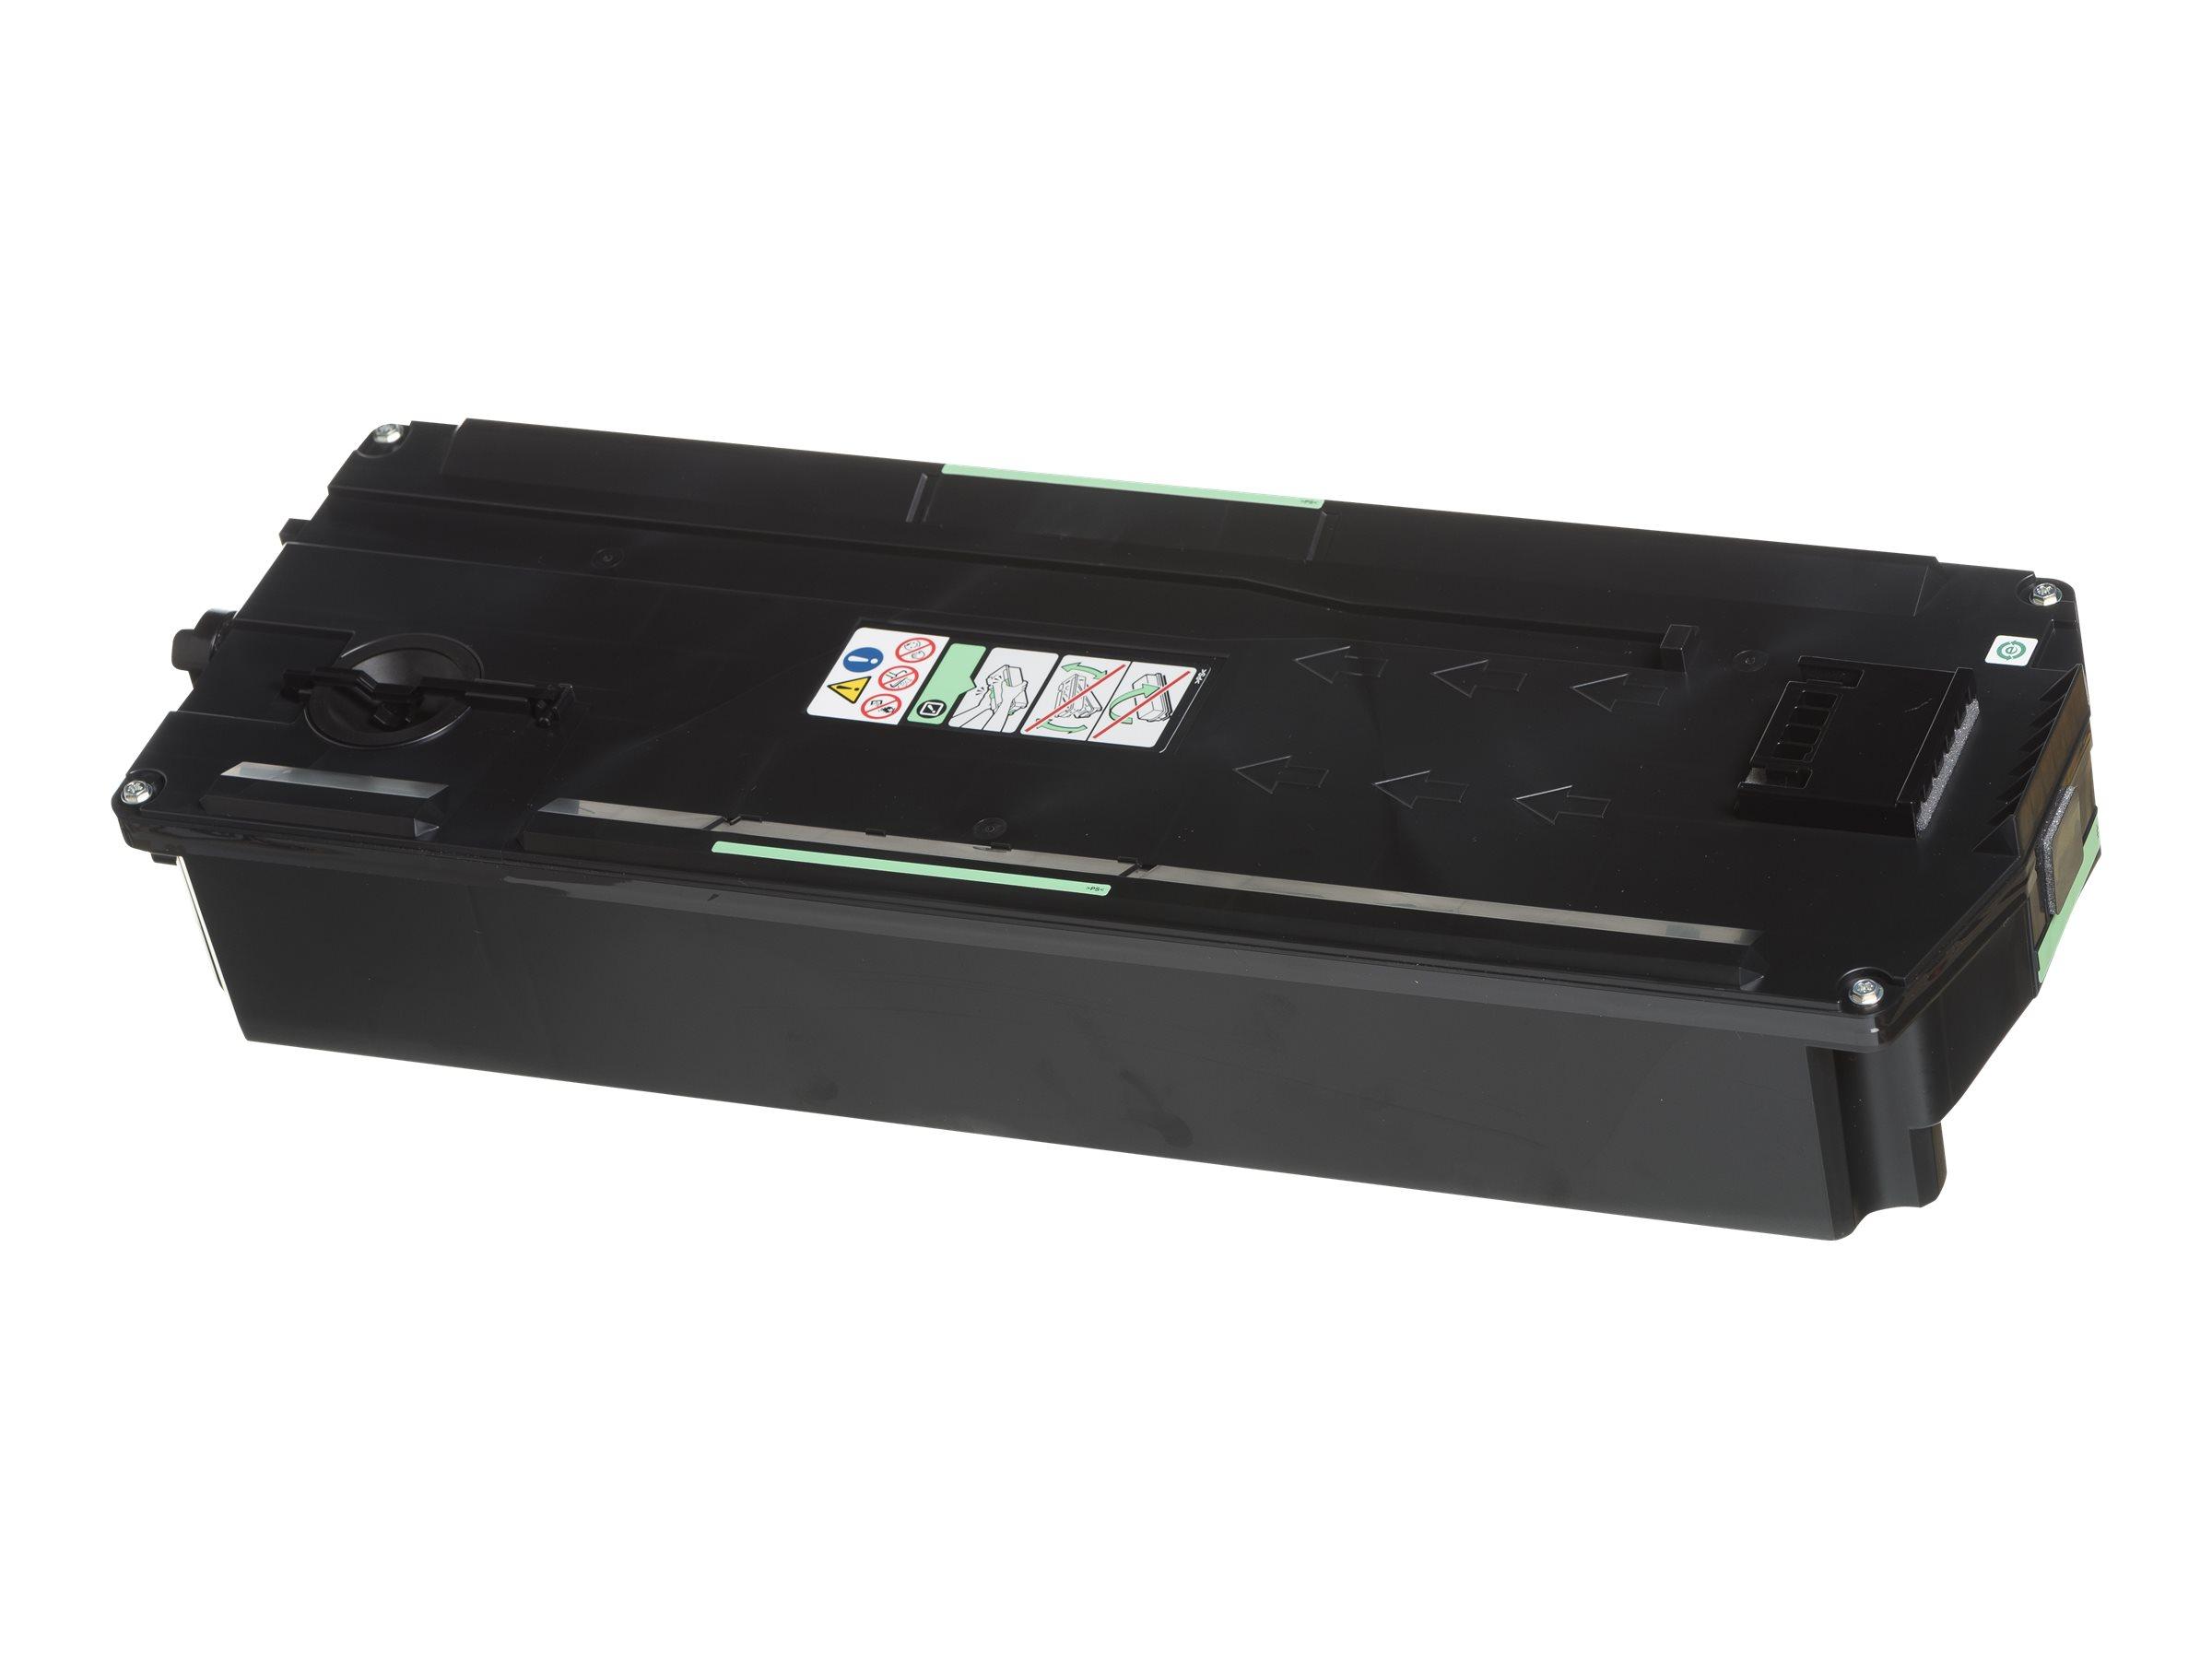 Ricoh MP C6003 - Tonersammler - für Ricoh MP C2003, MP C2004, MP C2503, MP C2504, MP C3004, MP C3504, MP C6003